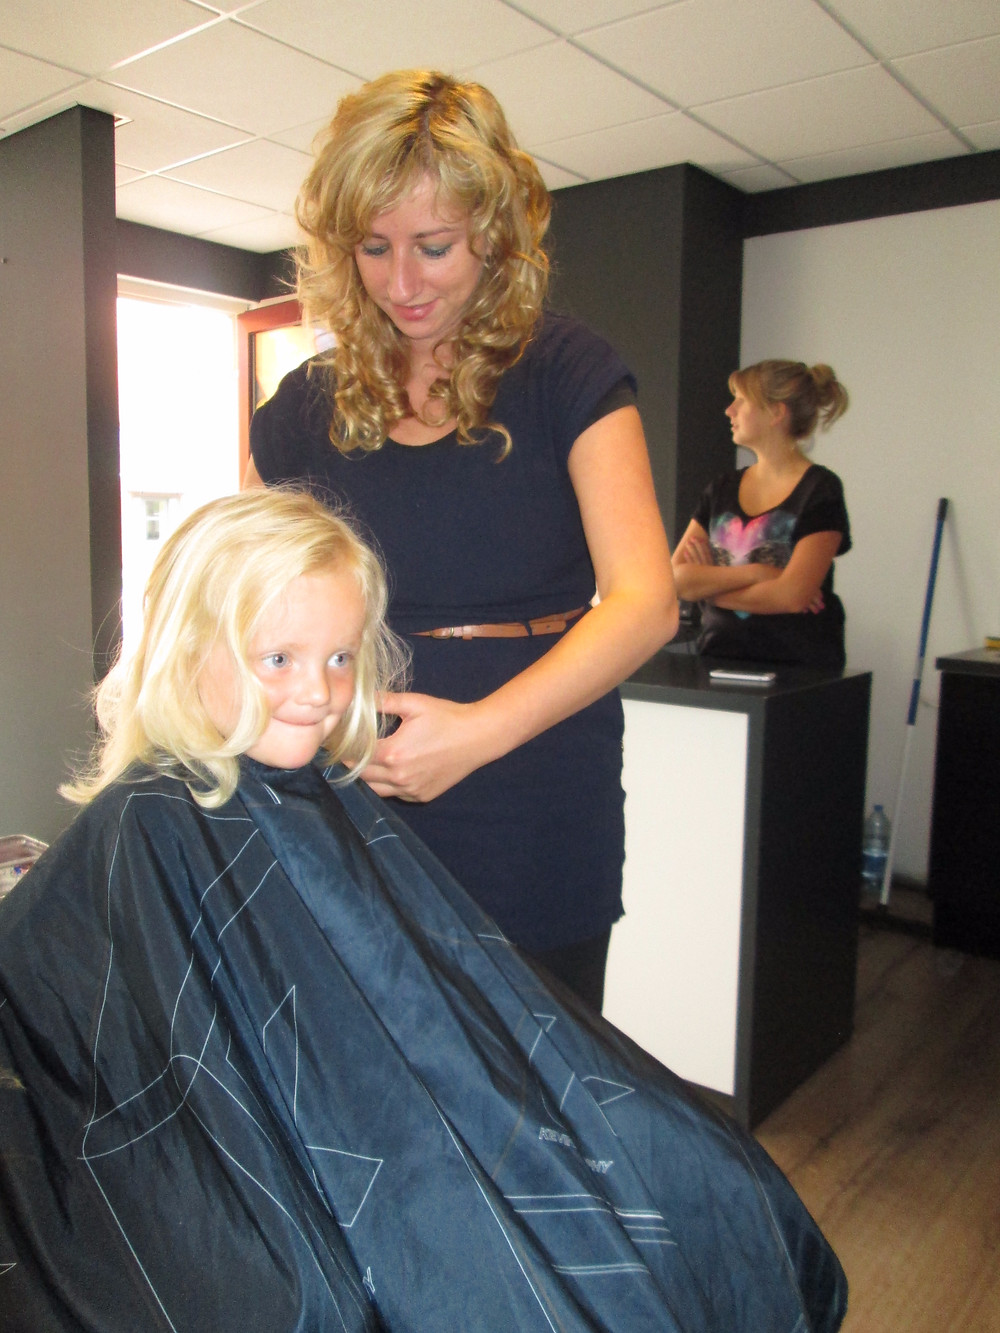 Kapsalon Shape & Style - Stichting Ramon scoort tegen kanker 1_edited.jpg